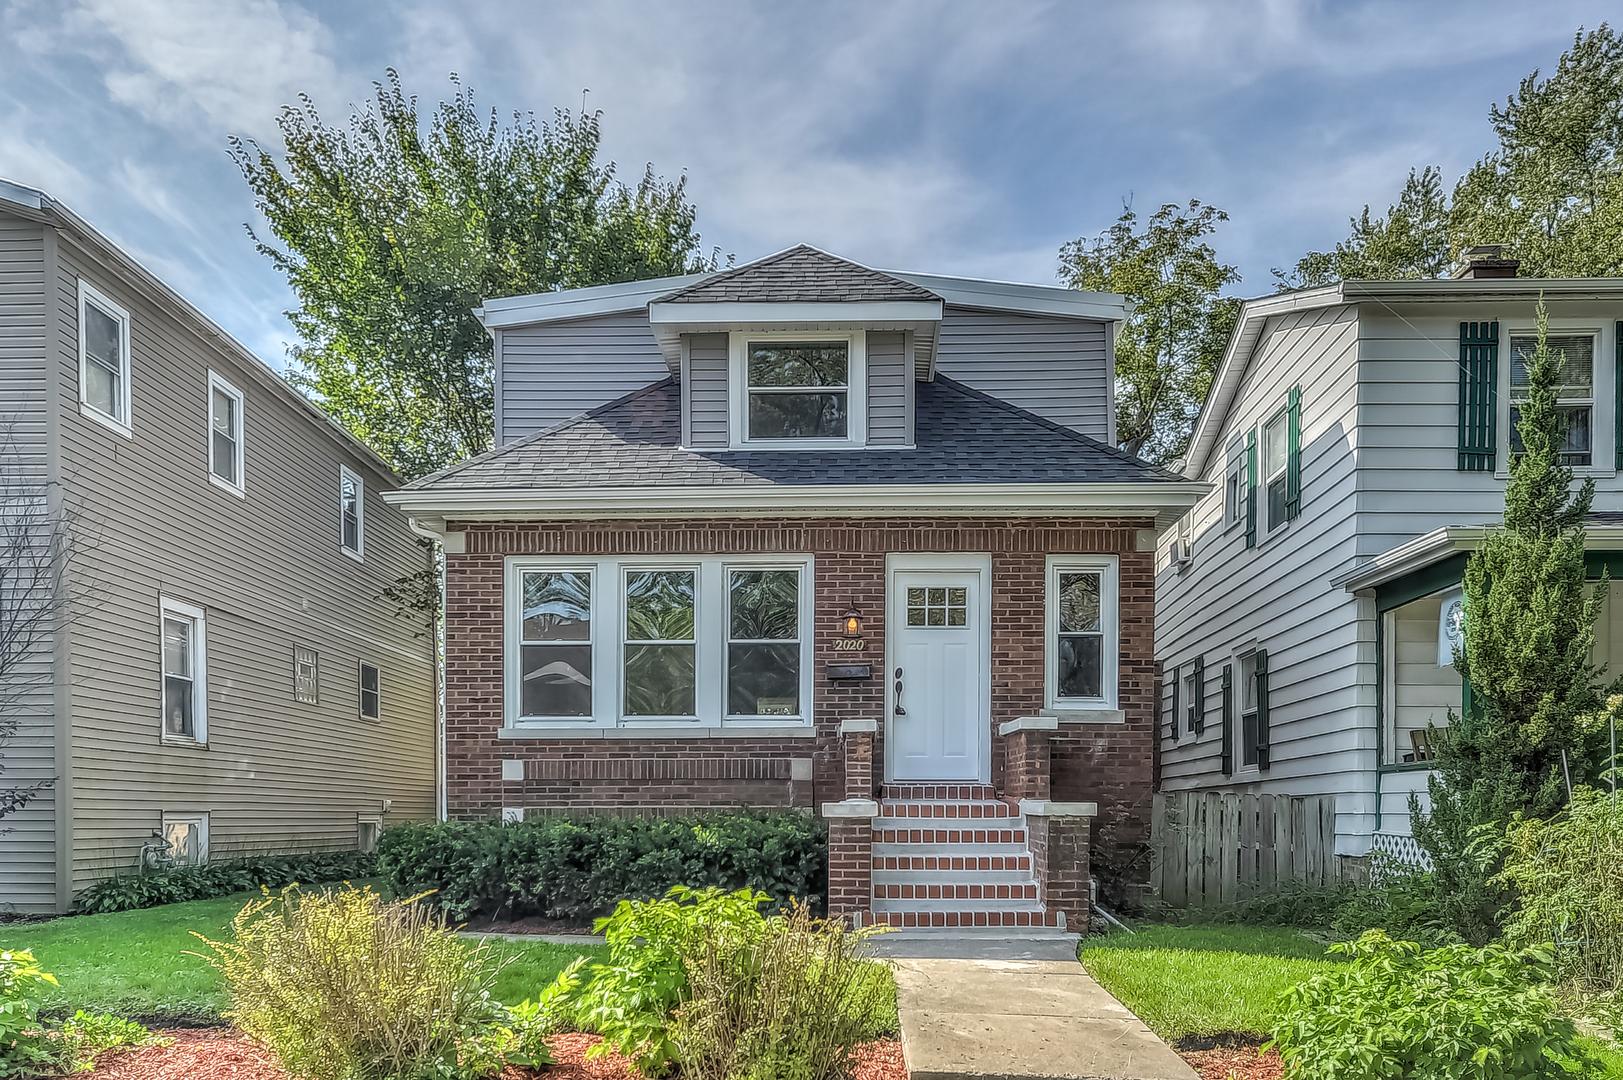 2020 Dodge Avenue, Evanston in Cook County, IL 60201 Home for Sale